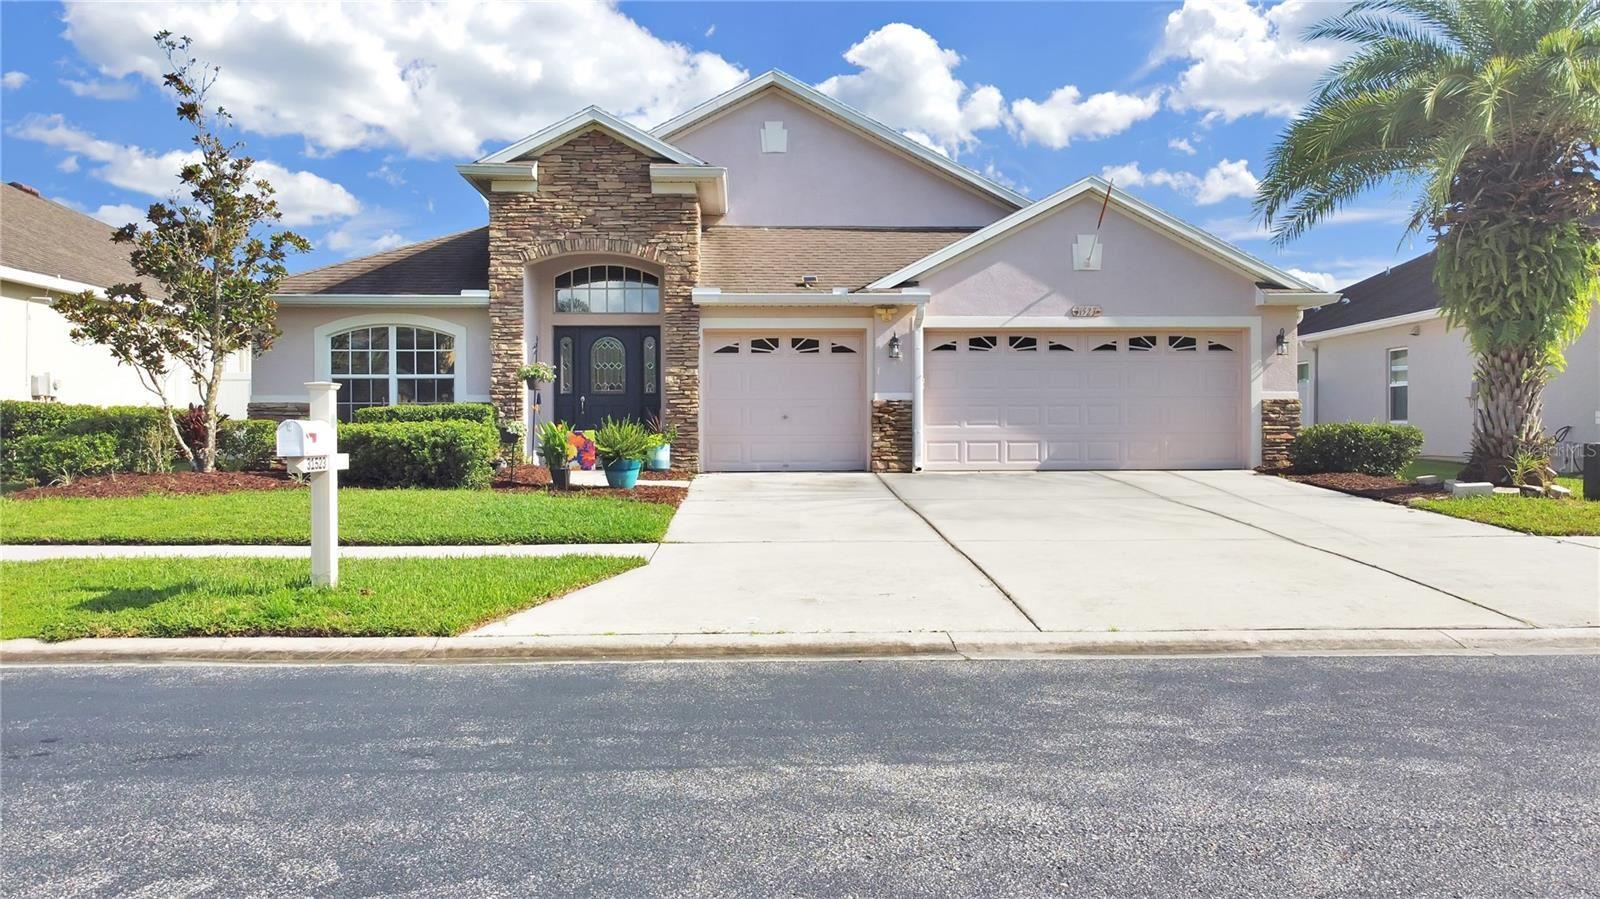 31523 HOLCOMB PASS, Wesley Chapel, FL 33543 - MLS#: T3327212